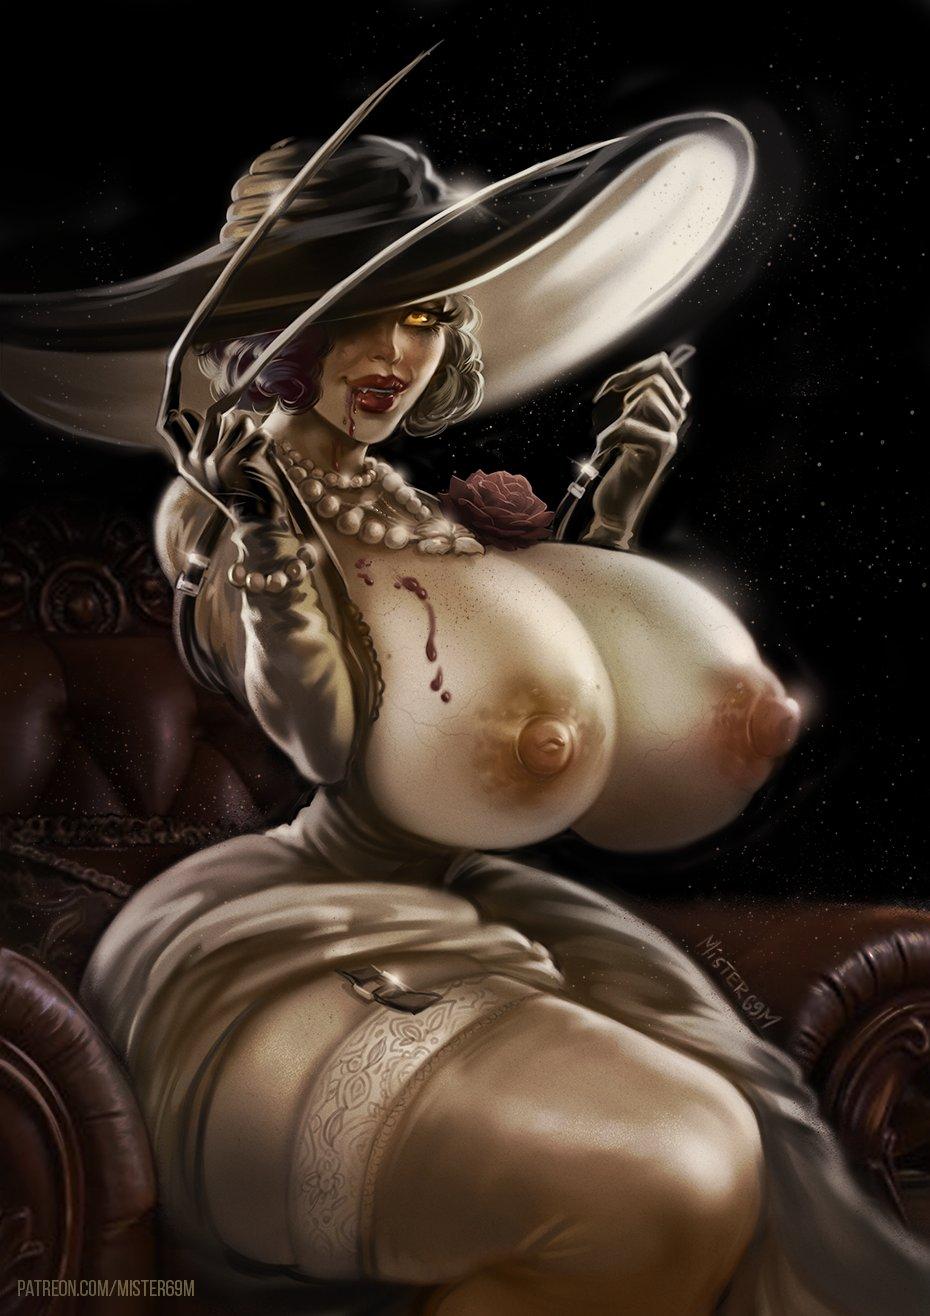 Mister69m - Alcina Dimitrescu Resident Evil 8 Village Porn 3